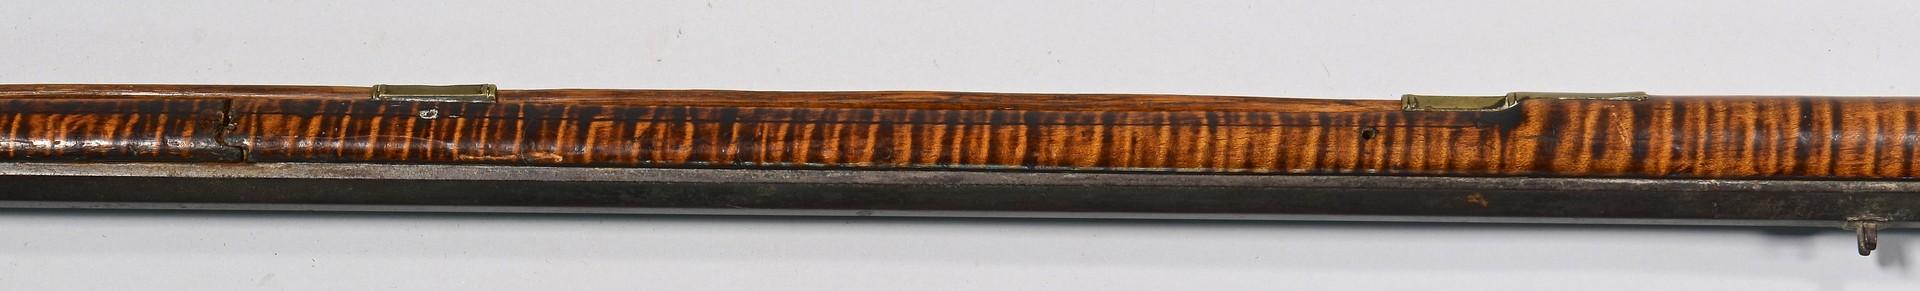 Lot 526: Kentucky Tiger Maple Rifle & Horn, TN provenance